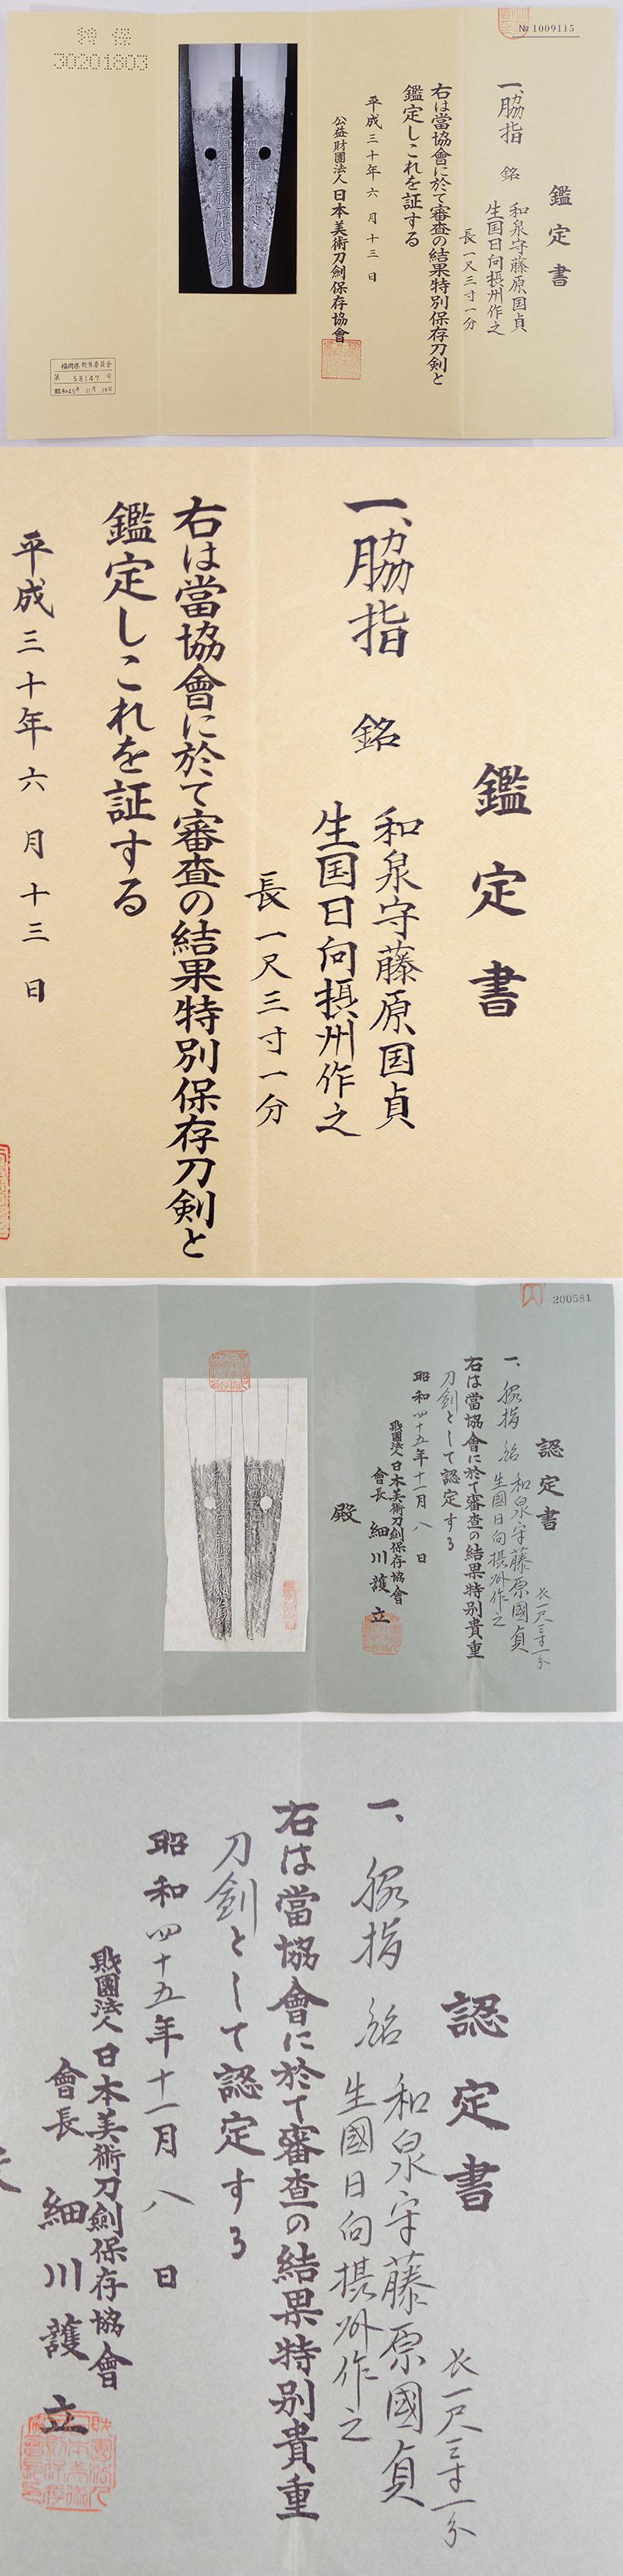 和泉守藤原国貞 (親国貞) Picture of Certificate